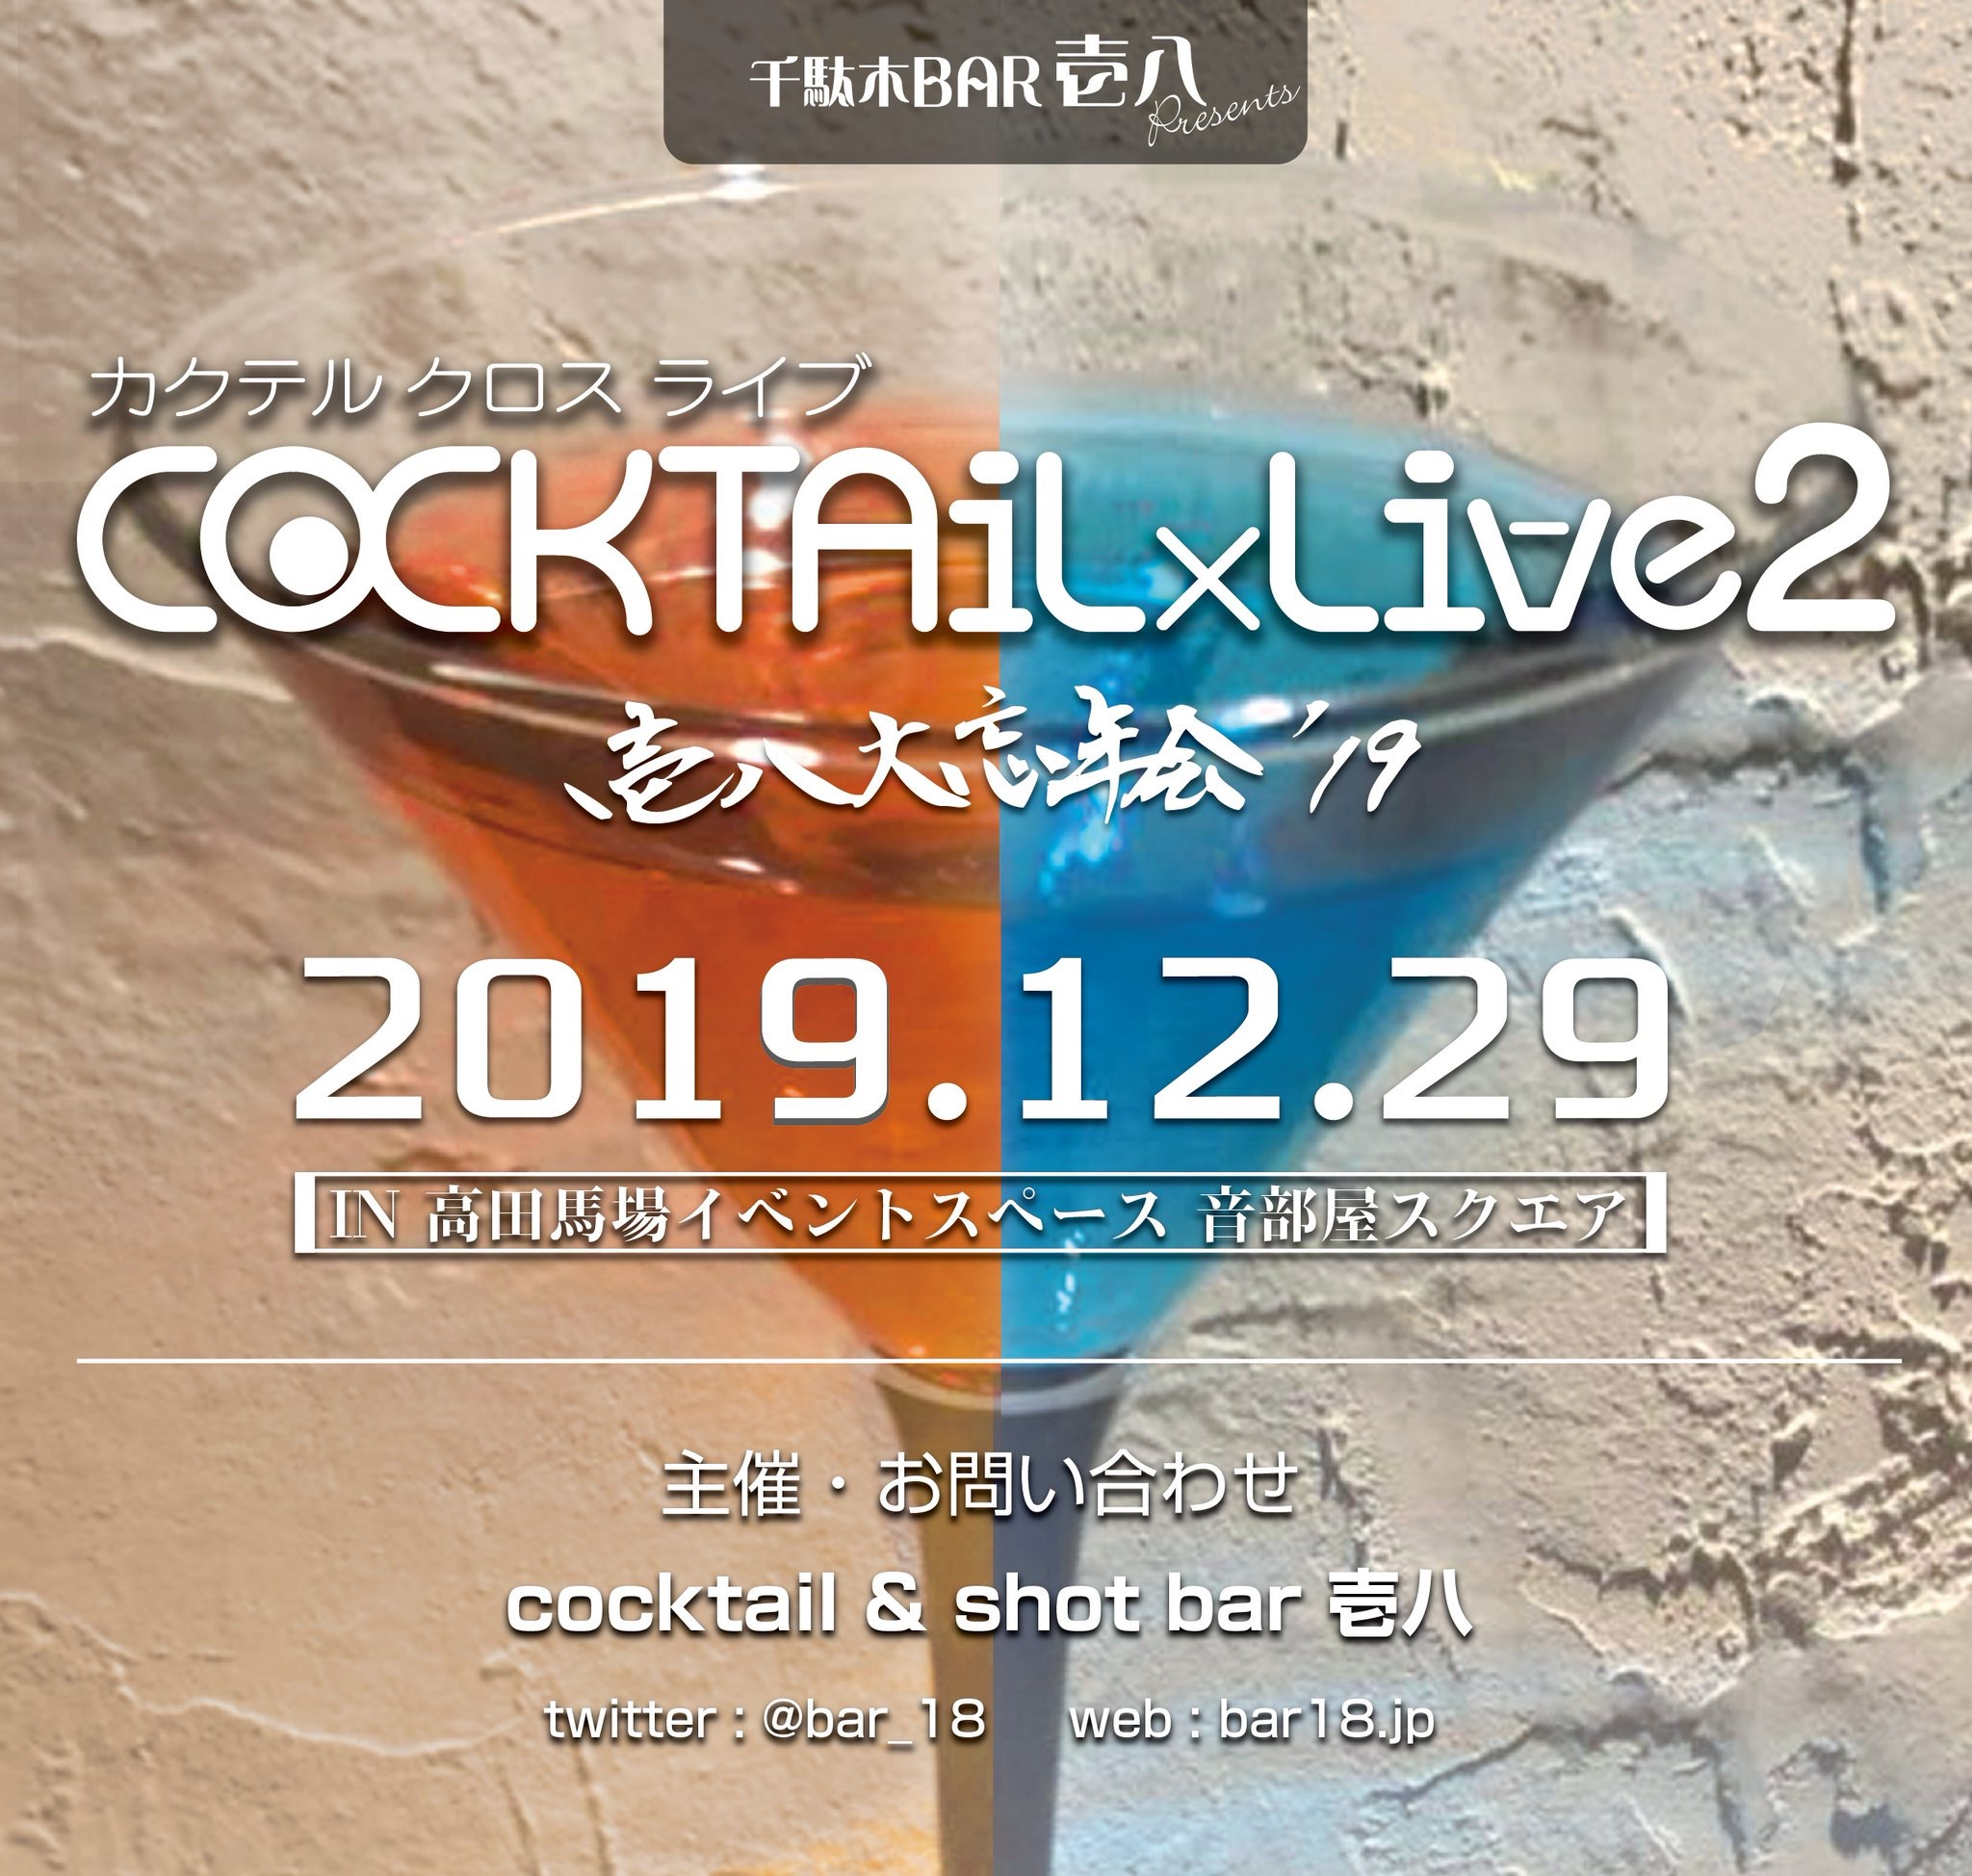 COCKTAiL x Live2 〜壱八大忘年会 '19〜